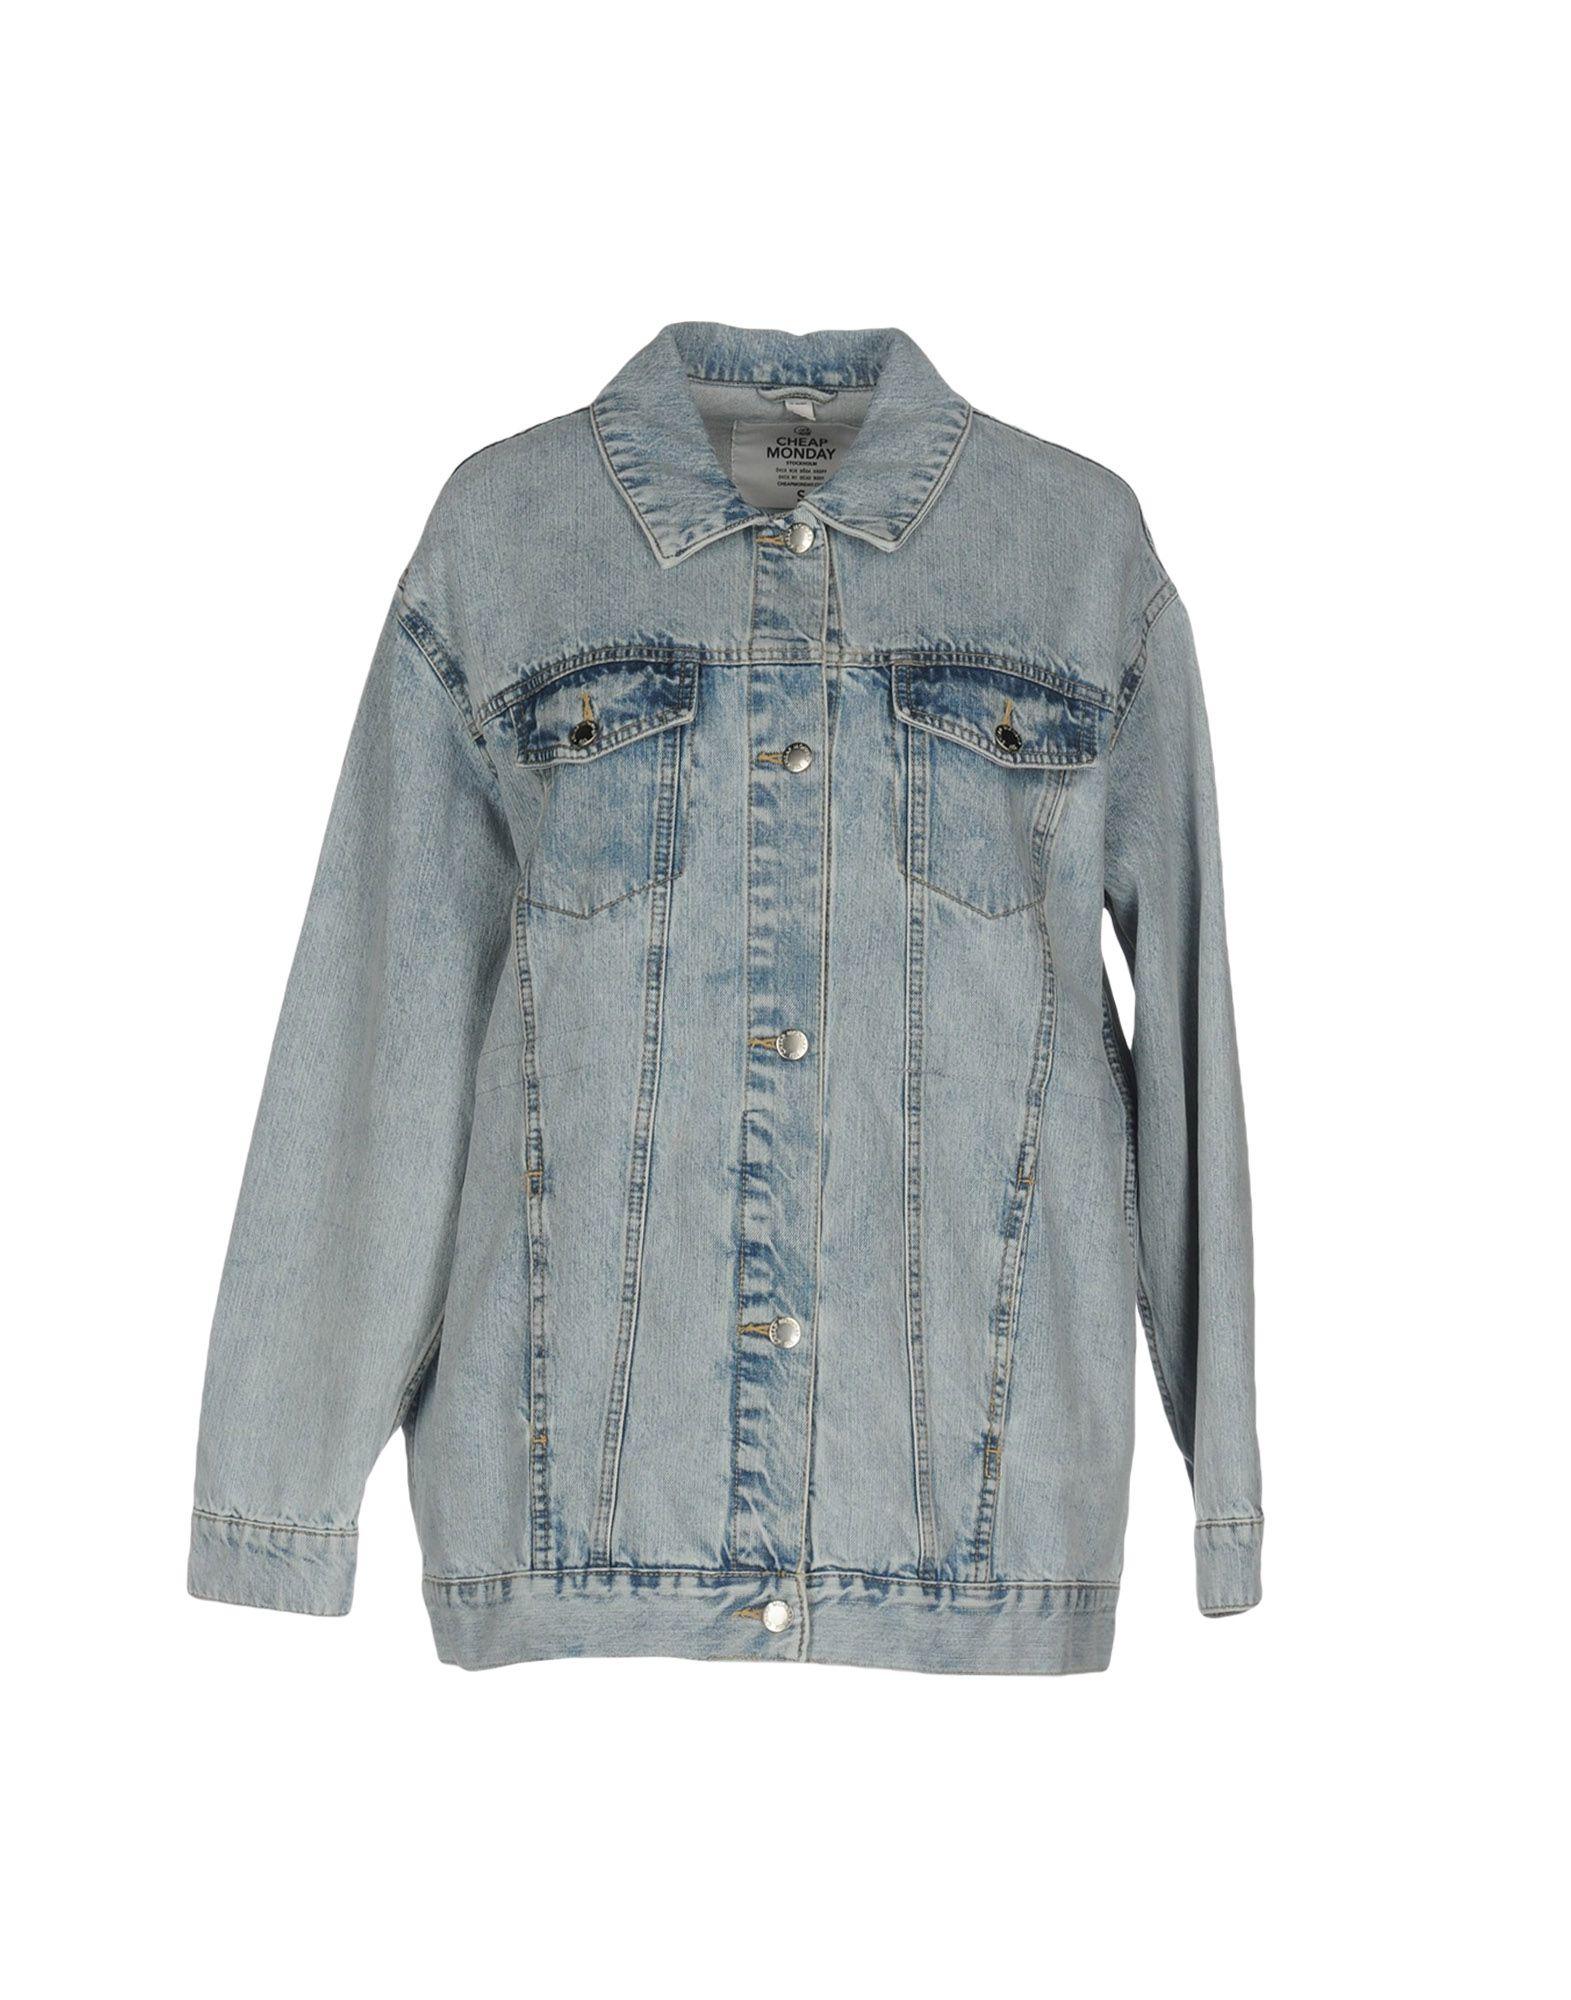 CHEAP MONDAY Джинсовая верхняя одежда cheap monday джинсовая верхняя одежда